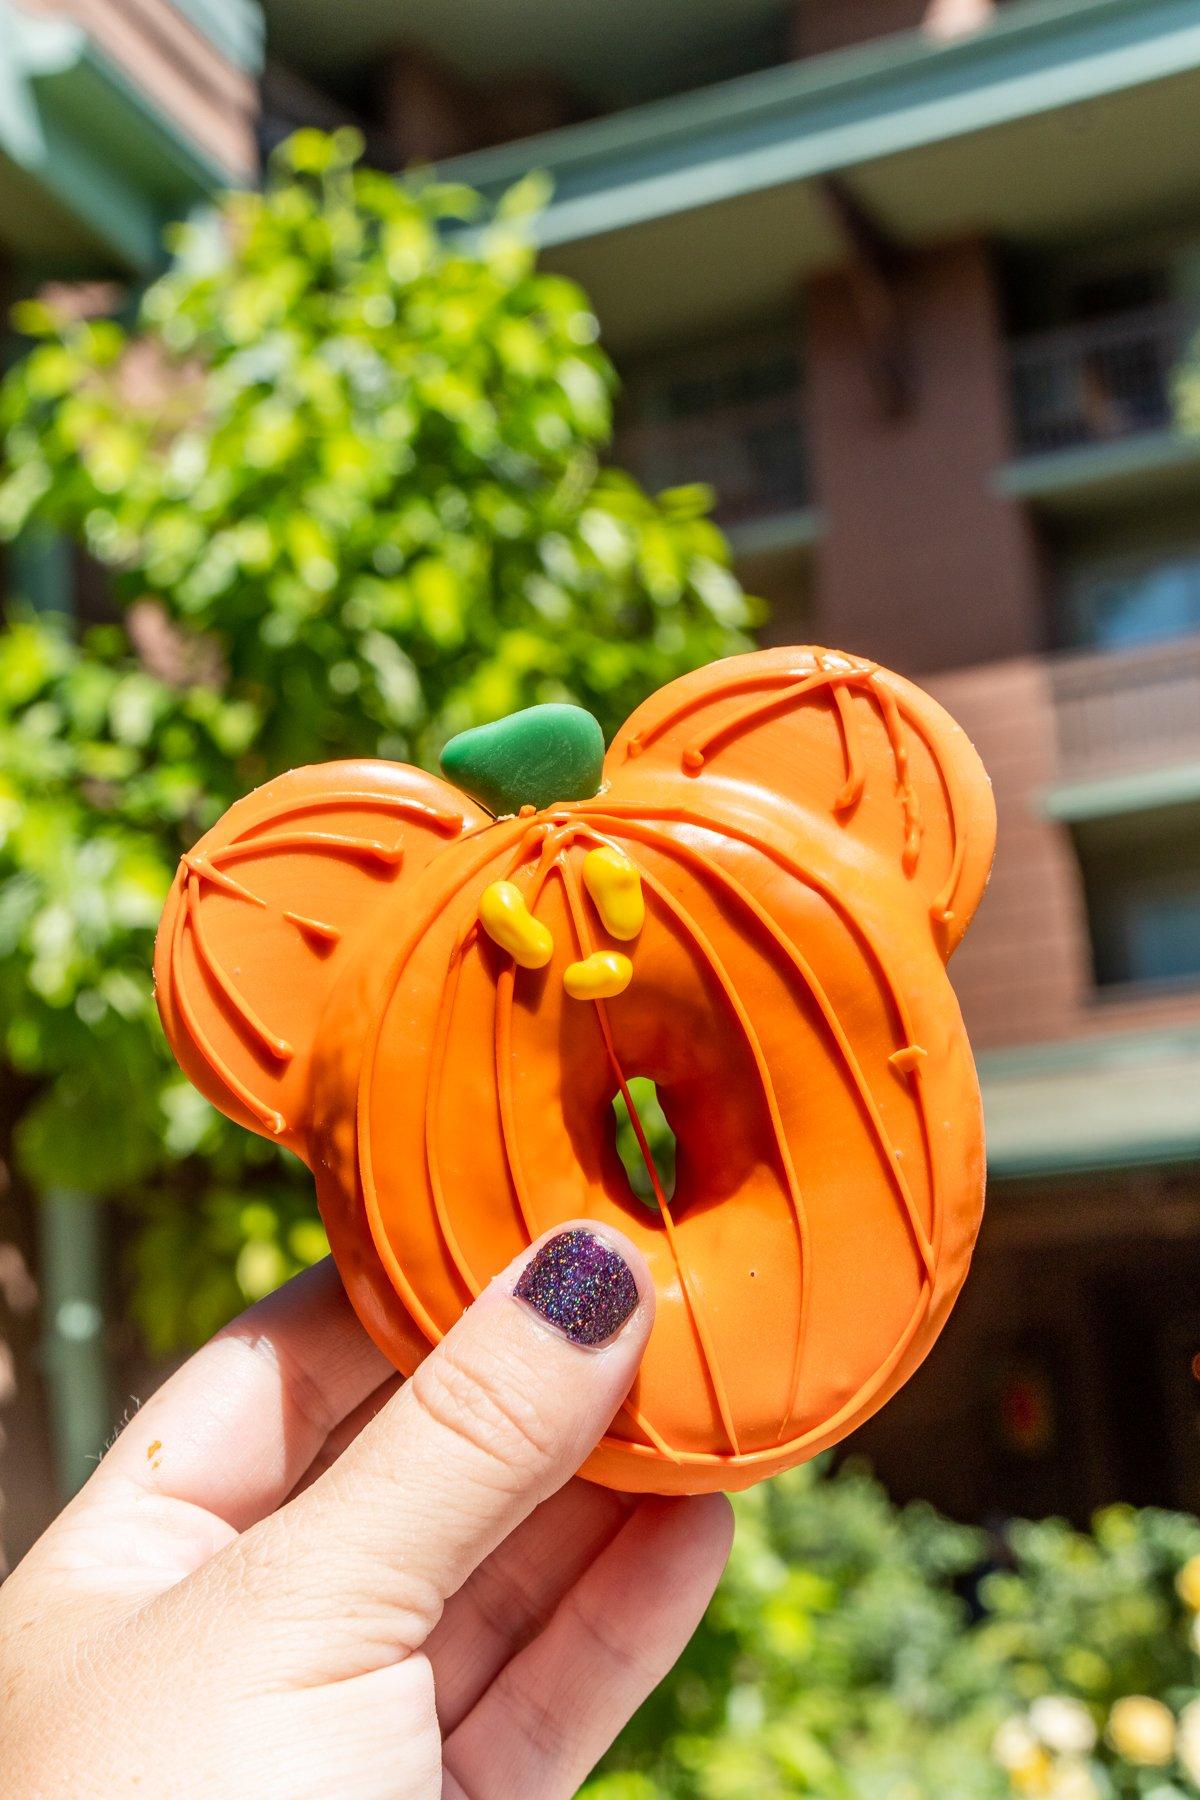 Mickey pumpkin donut in somoene's hand